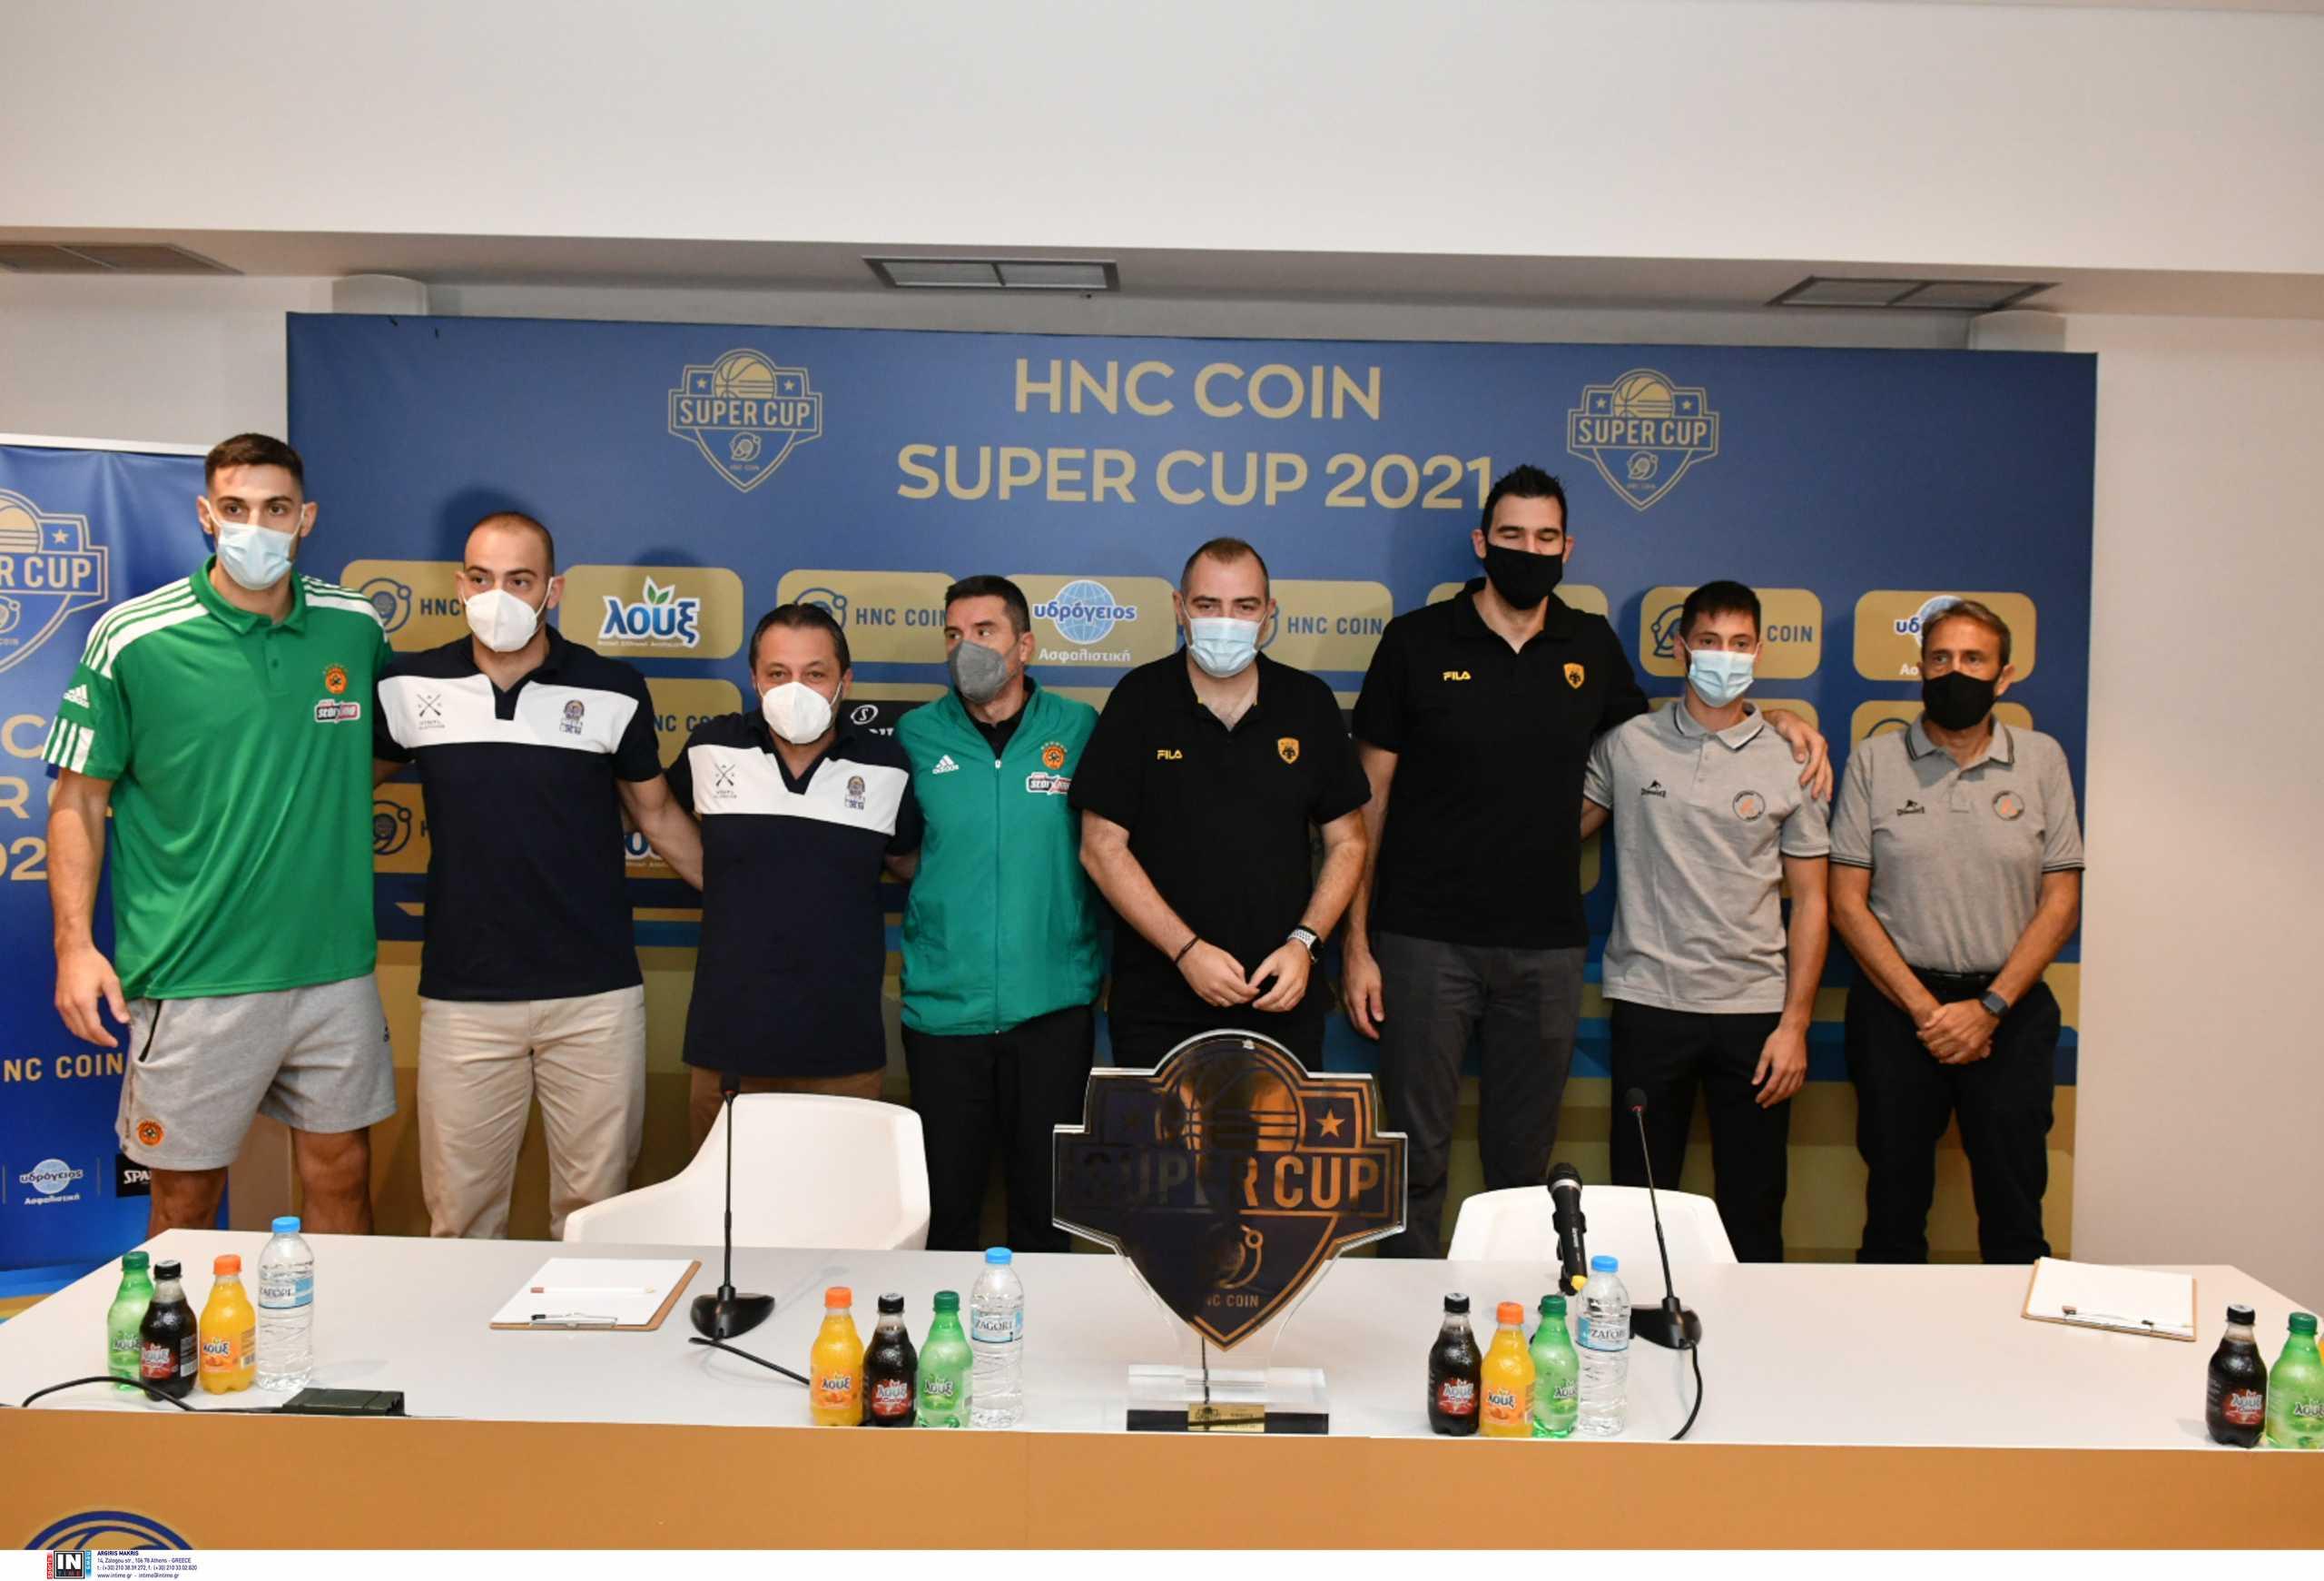 Super Cup μπάσκετ: Παναθηναϊκός, ΑΕΚ, Προμηθέας και Λαύριο διεκδικούν τον πρώτο τίτλο της σεζόν